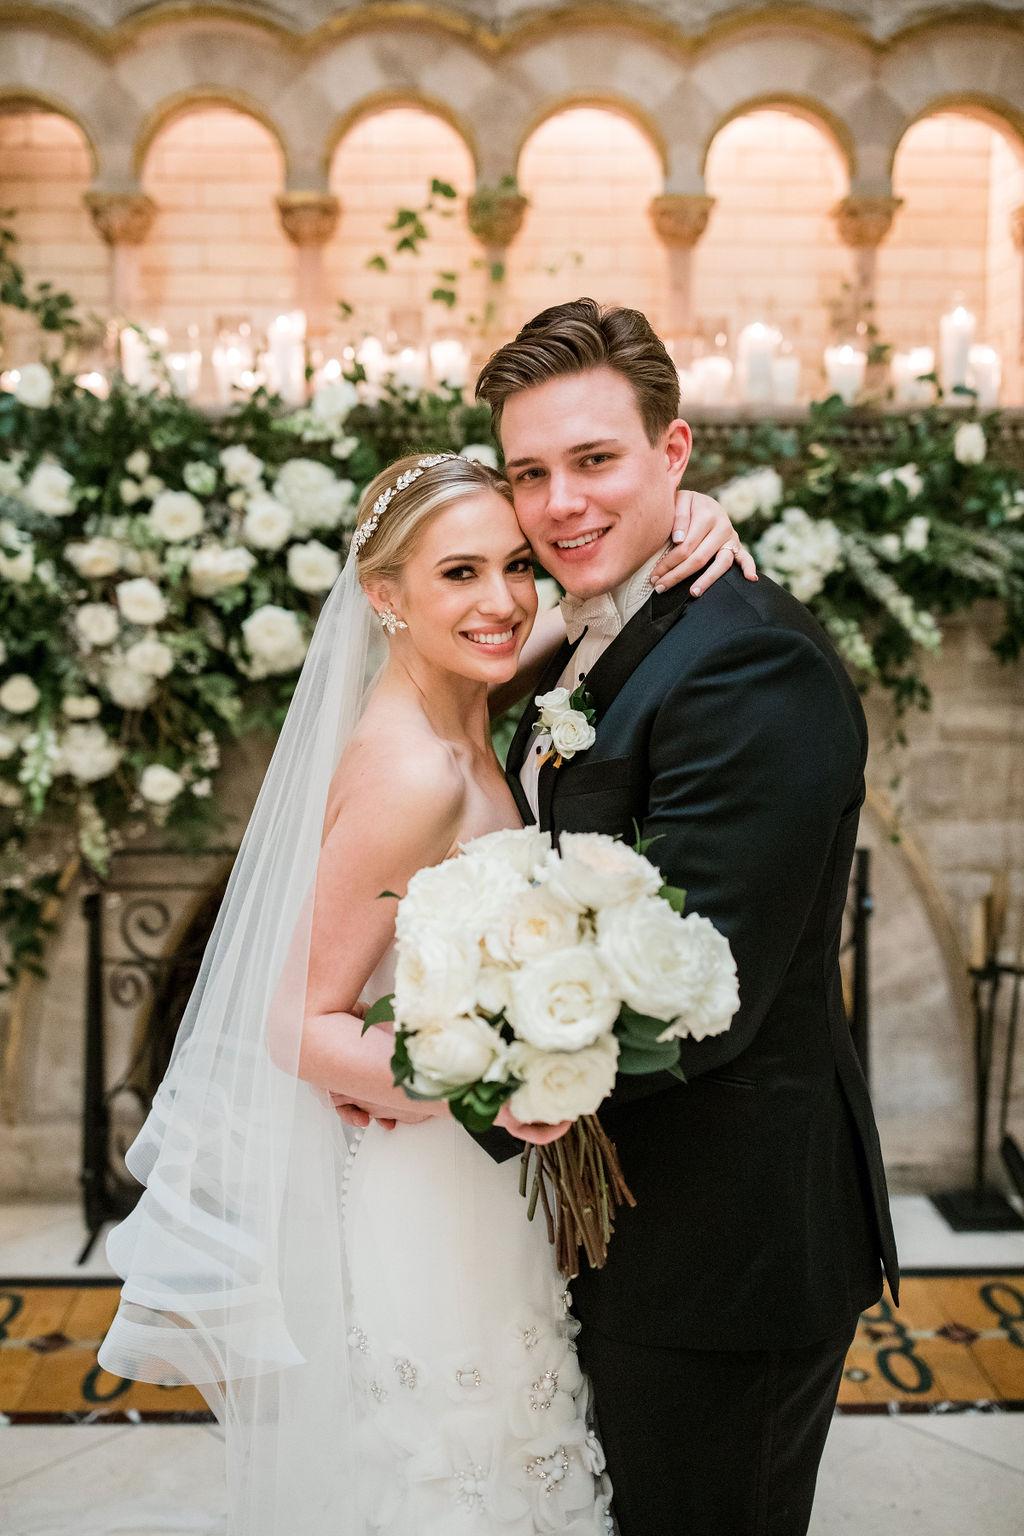 White wedding bouquet: Lavish Union Station Hotel Wedding featured on Nashville Bride Guide